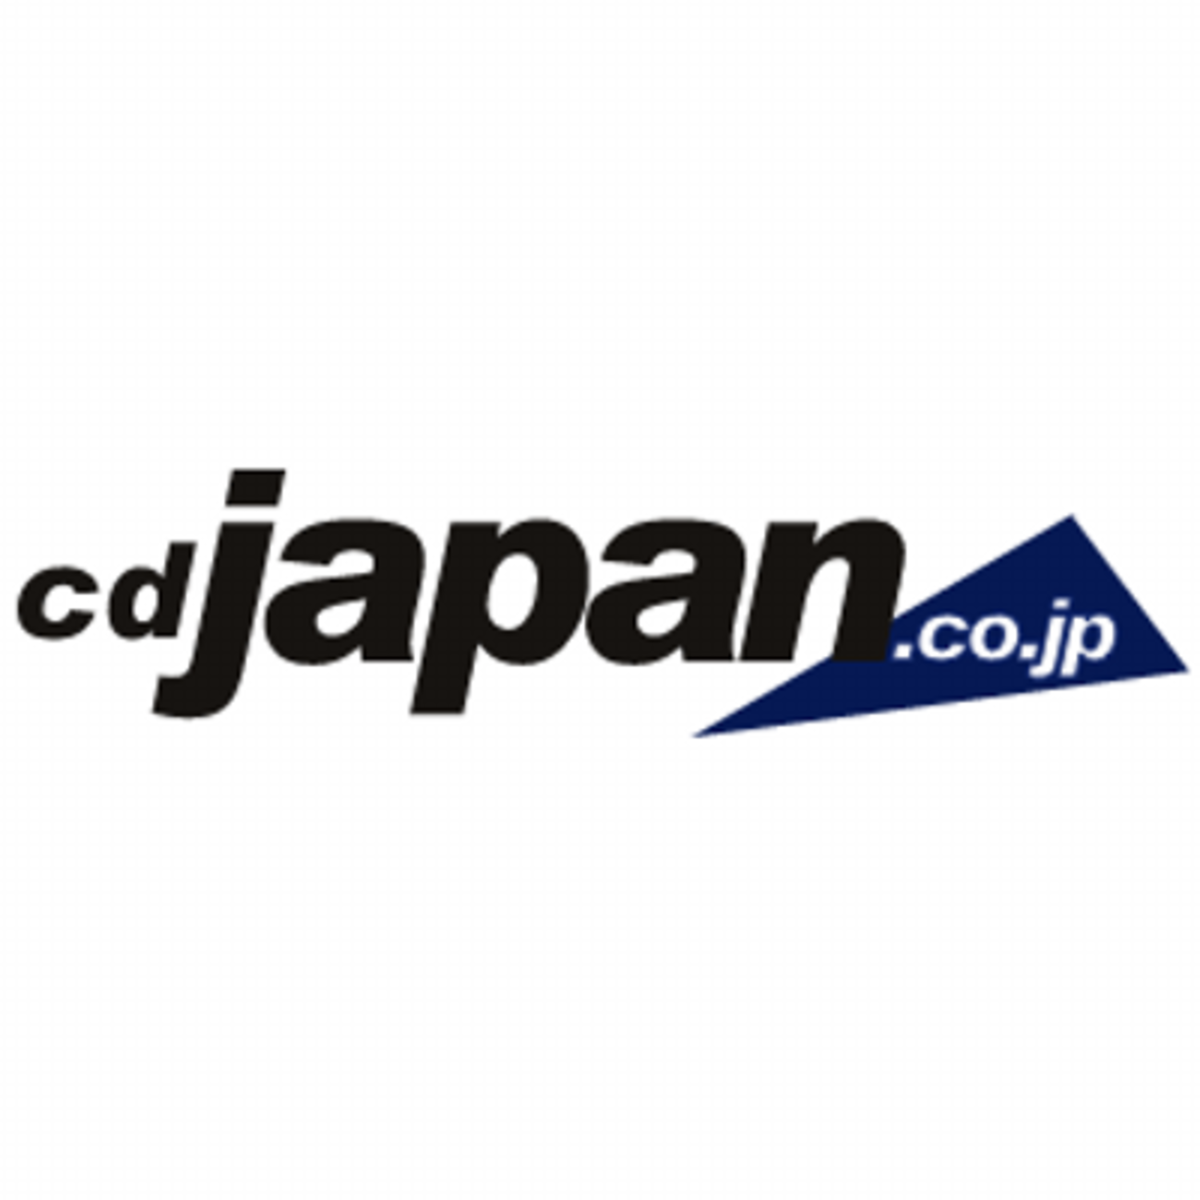 CDJapan logo.